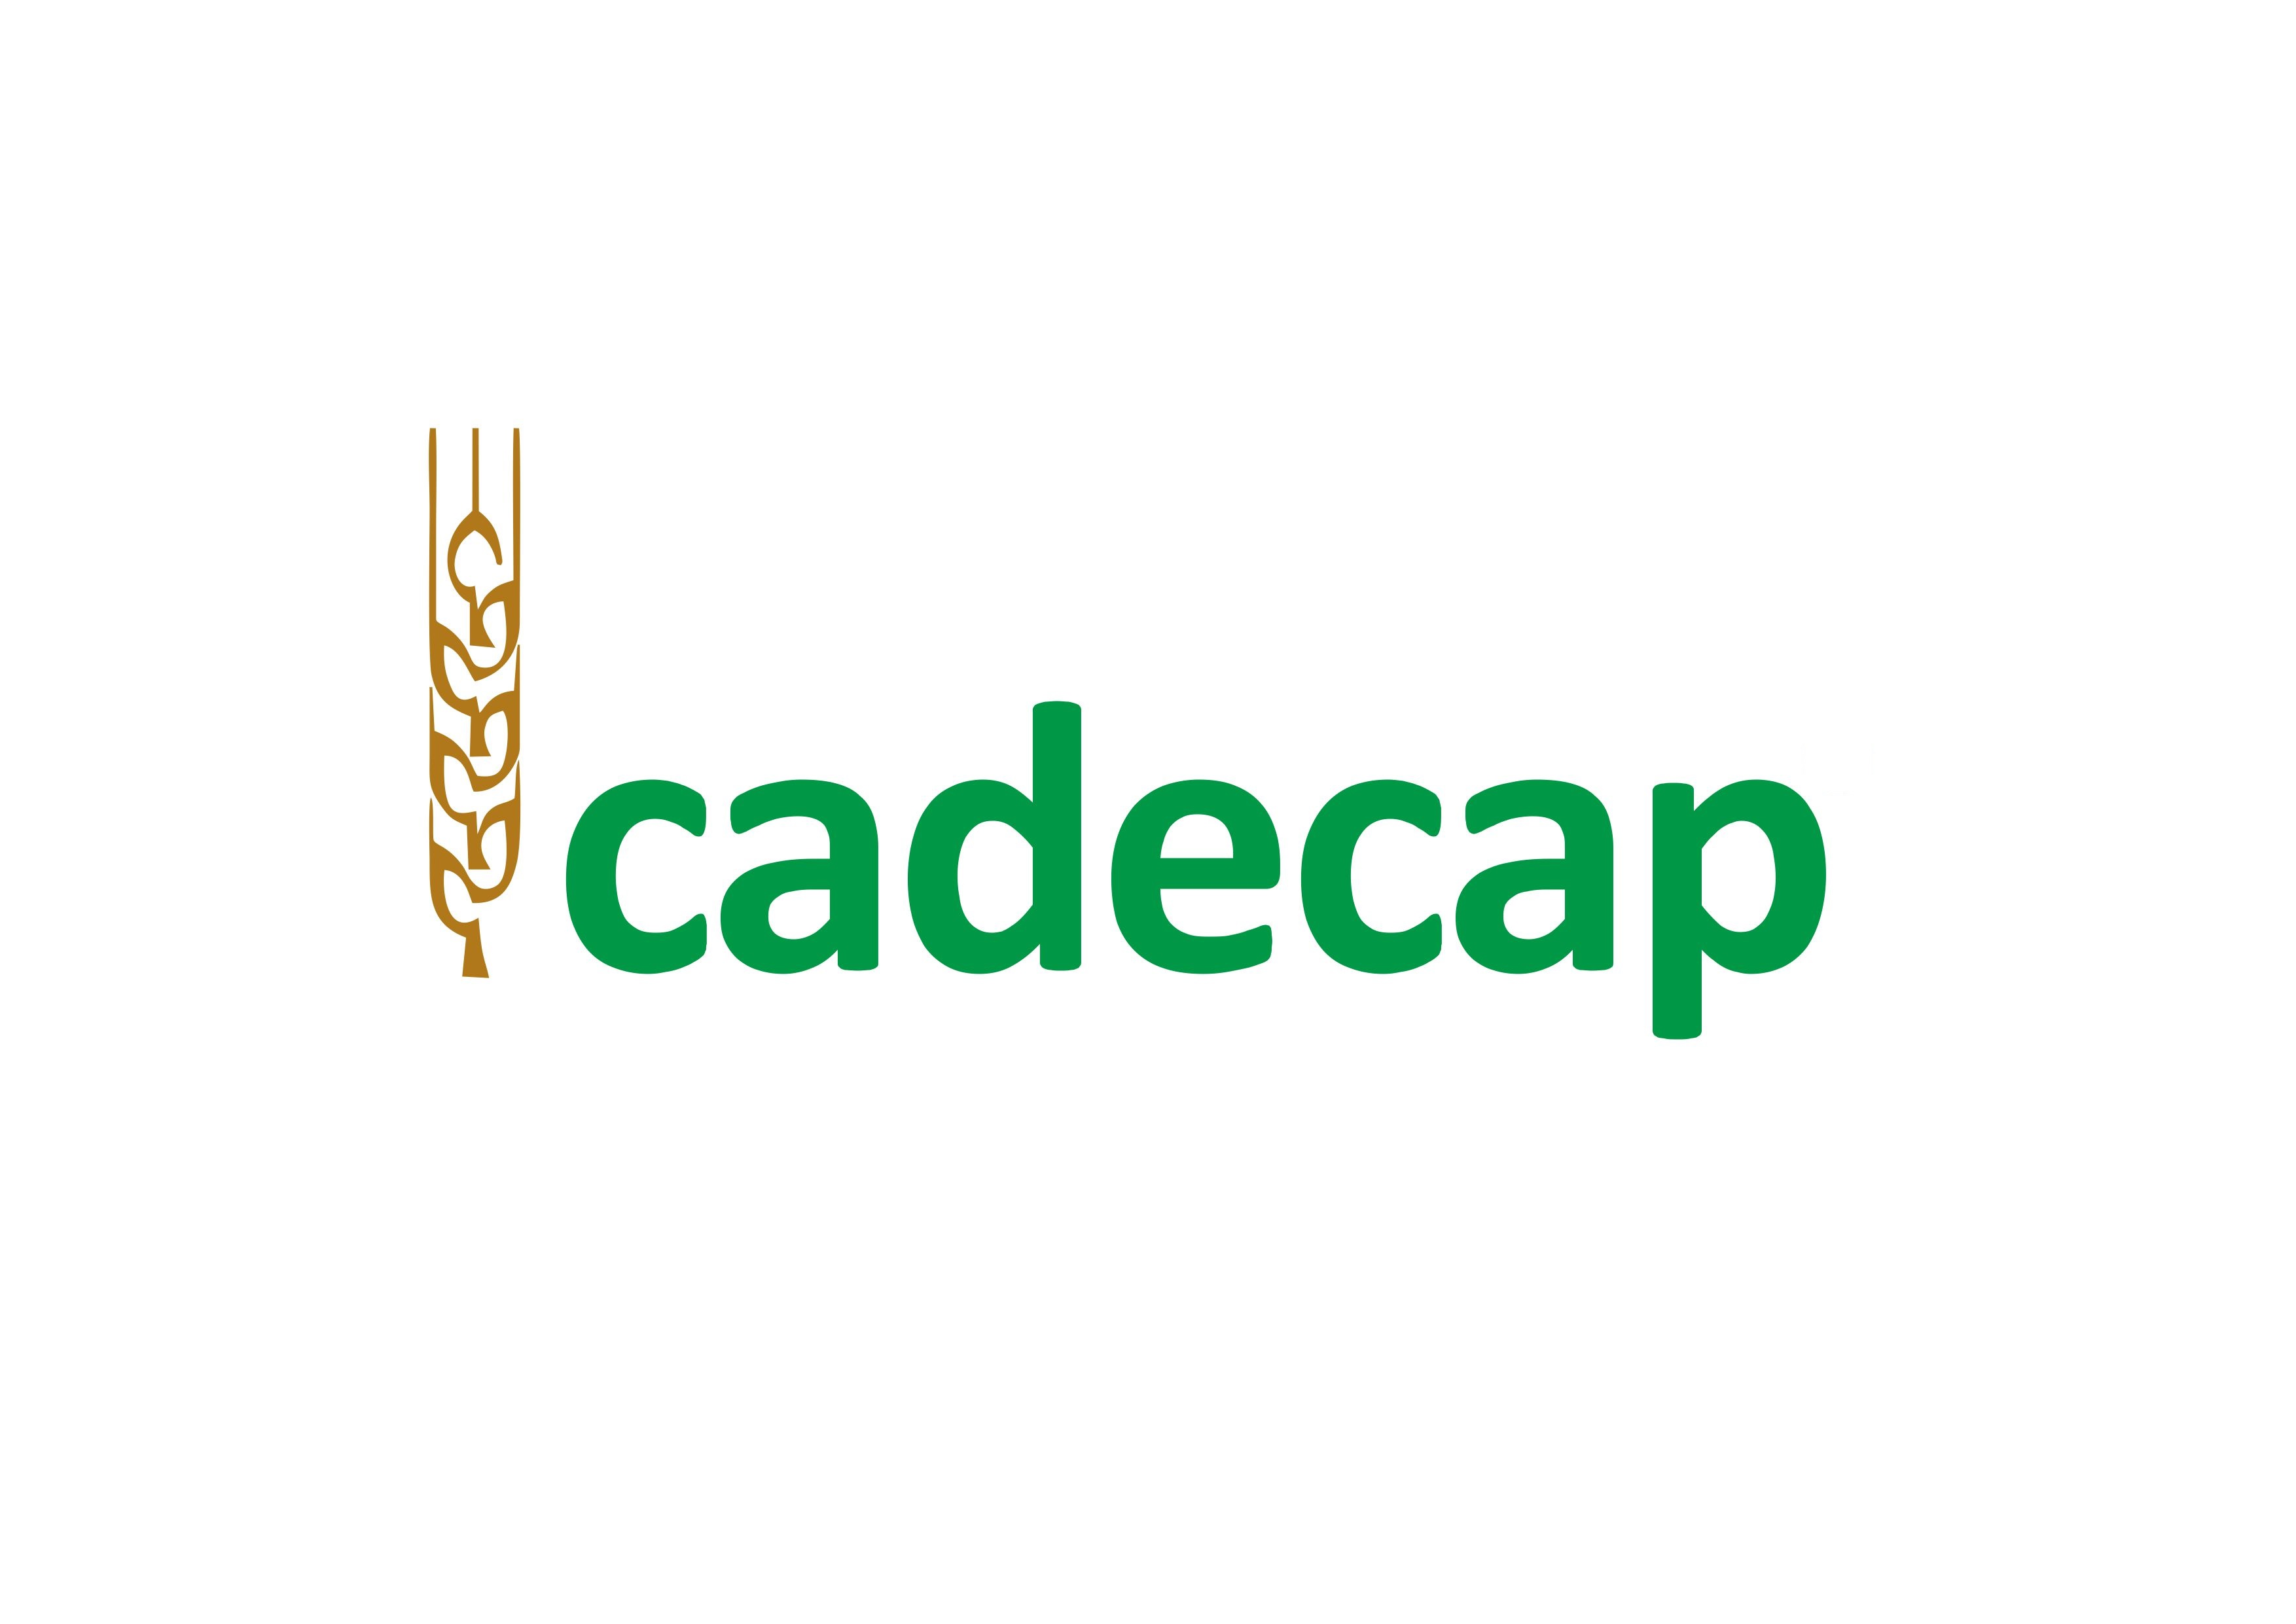 CADECAP